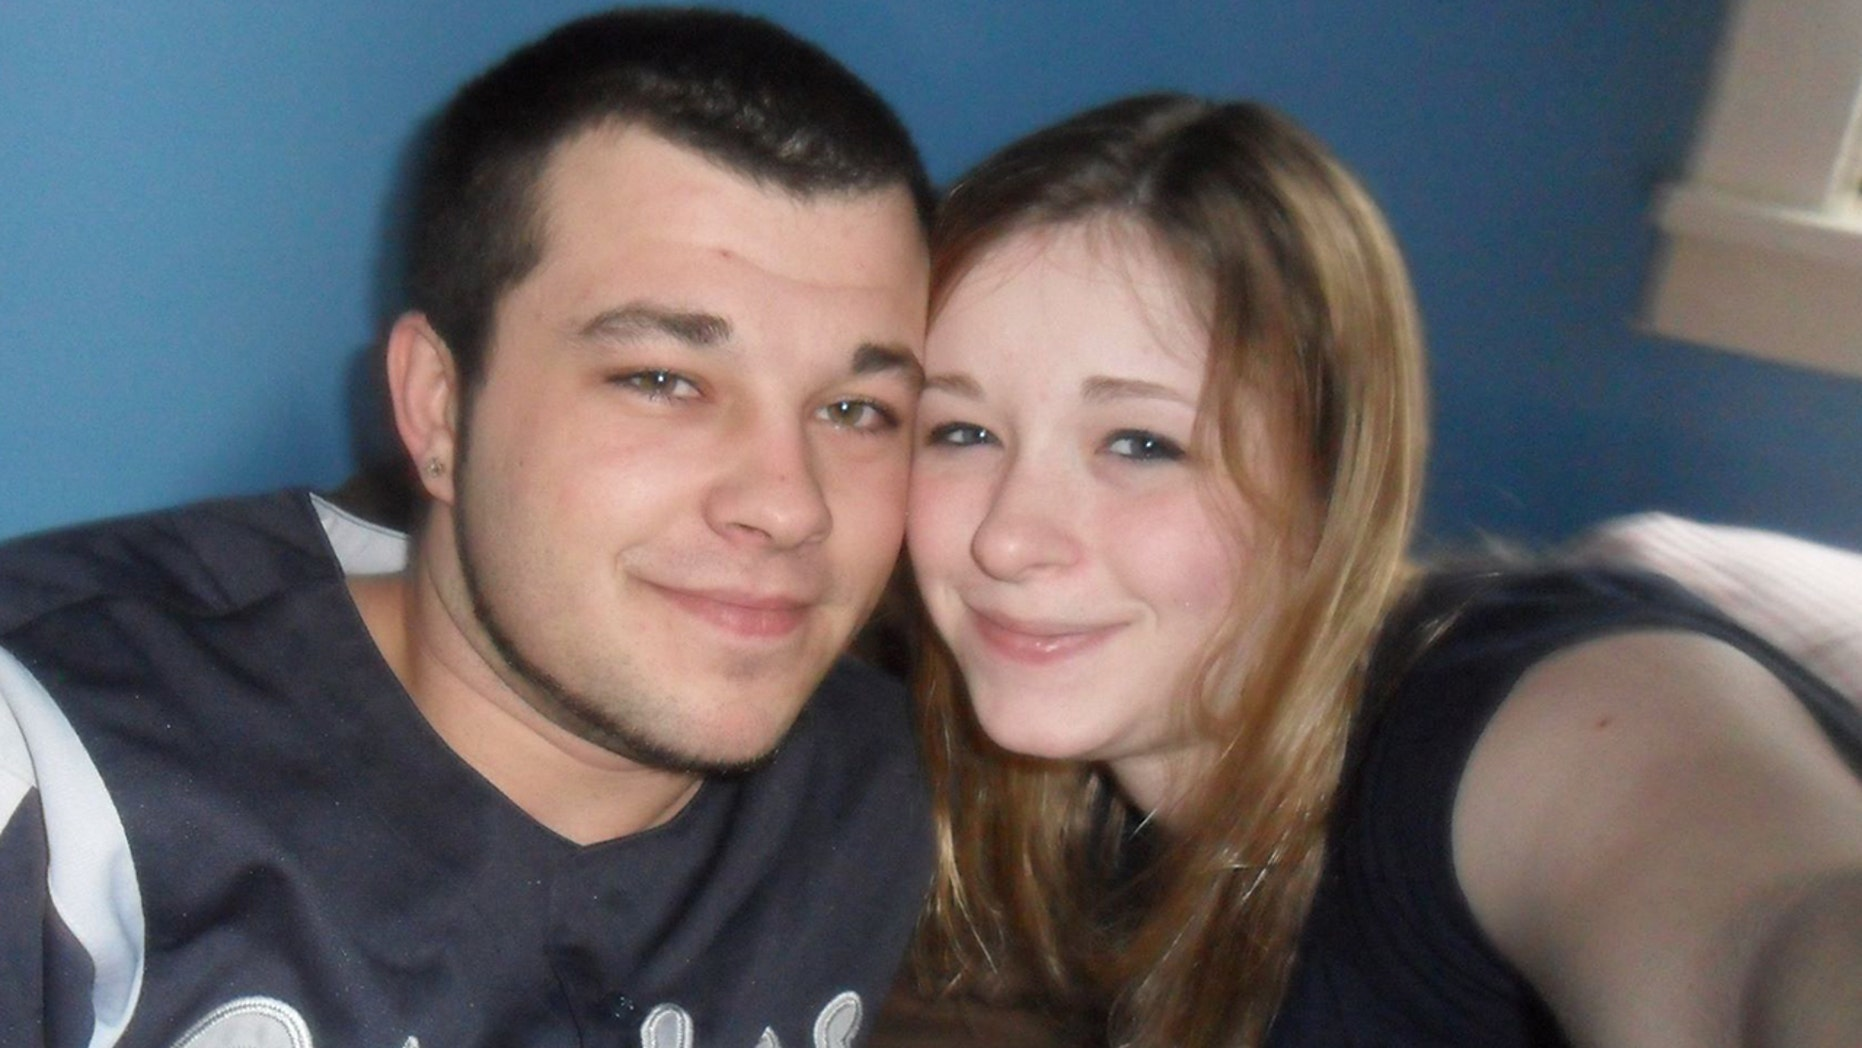 Joshua Niles, 28, and Amber Washburn, 24, were shot and killed Monday.